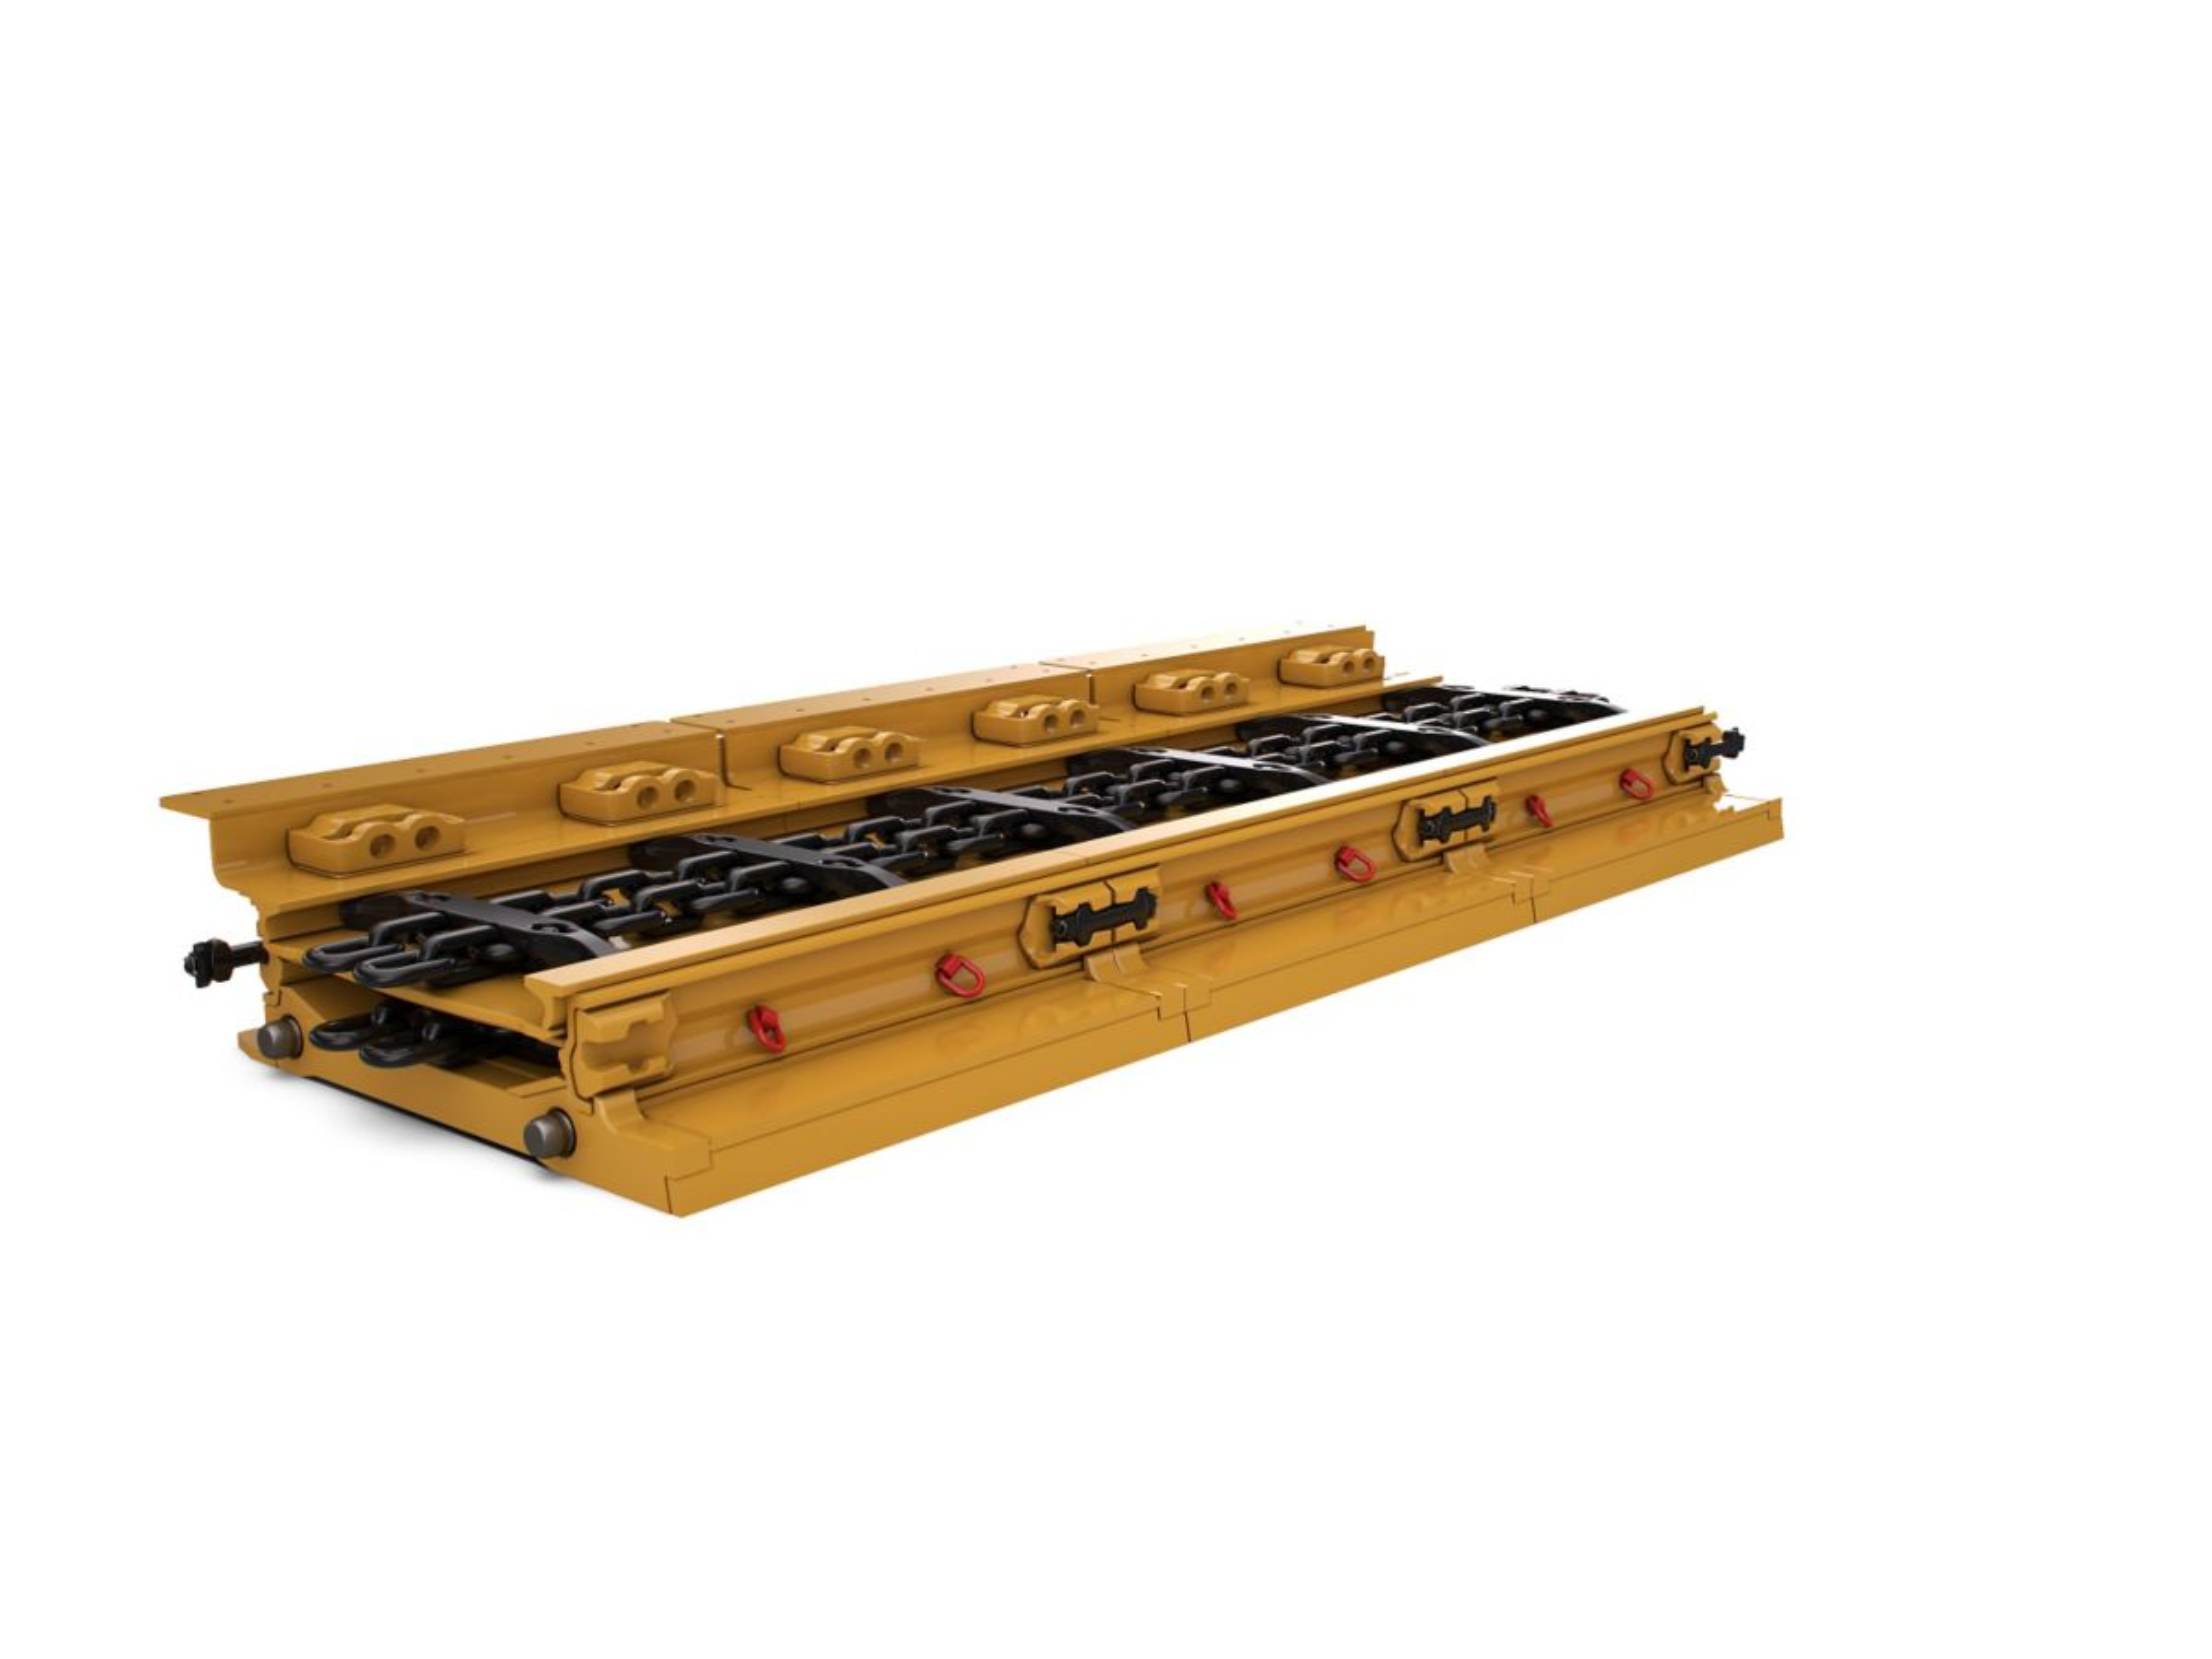 PF7 Face Conveyor Line Pan